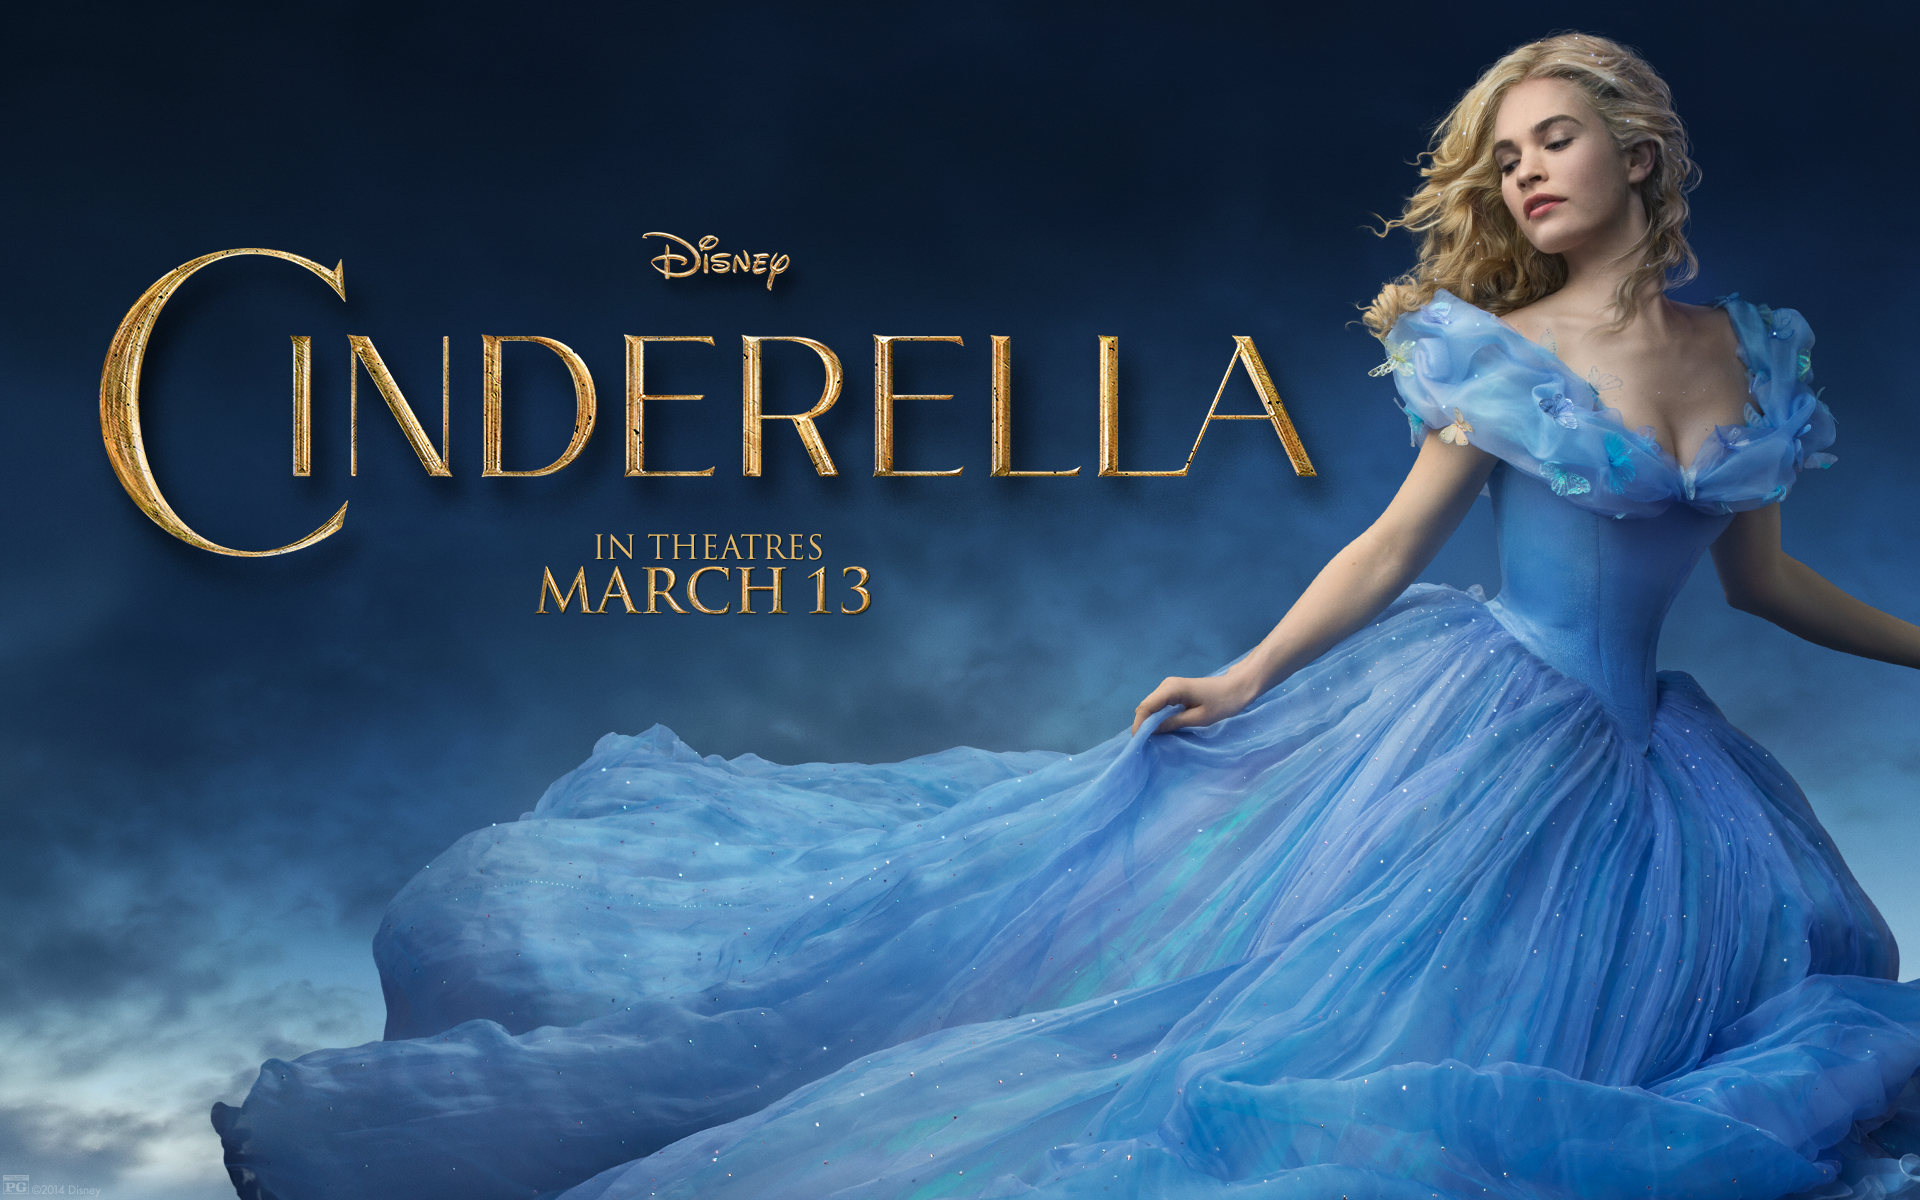 「cinderella 2015」の画像検索結果